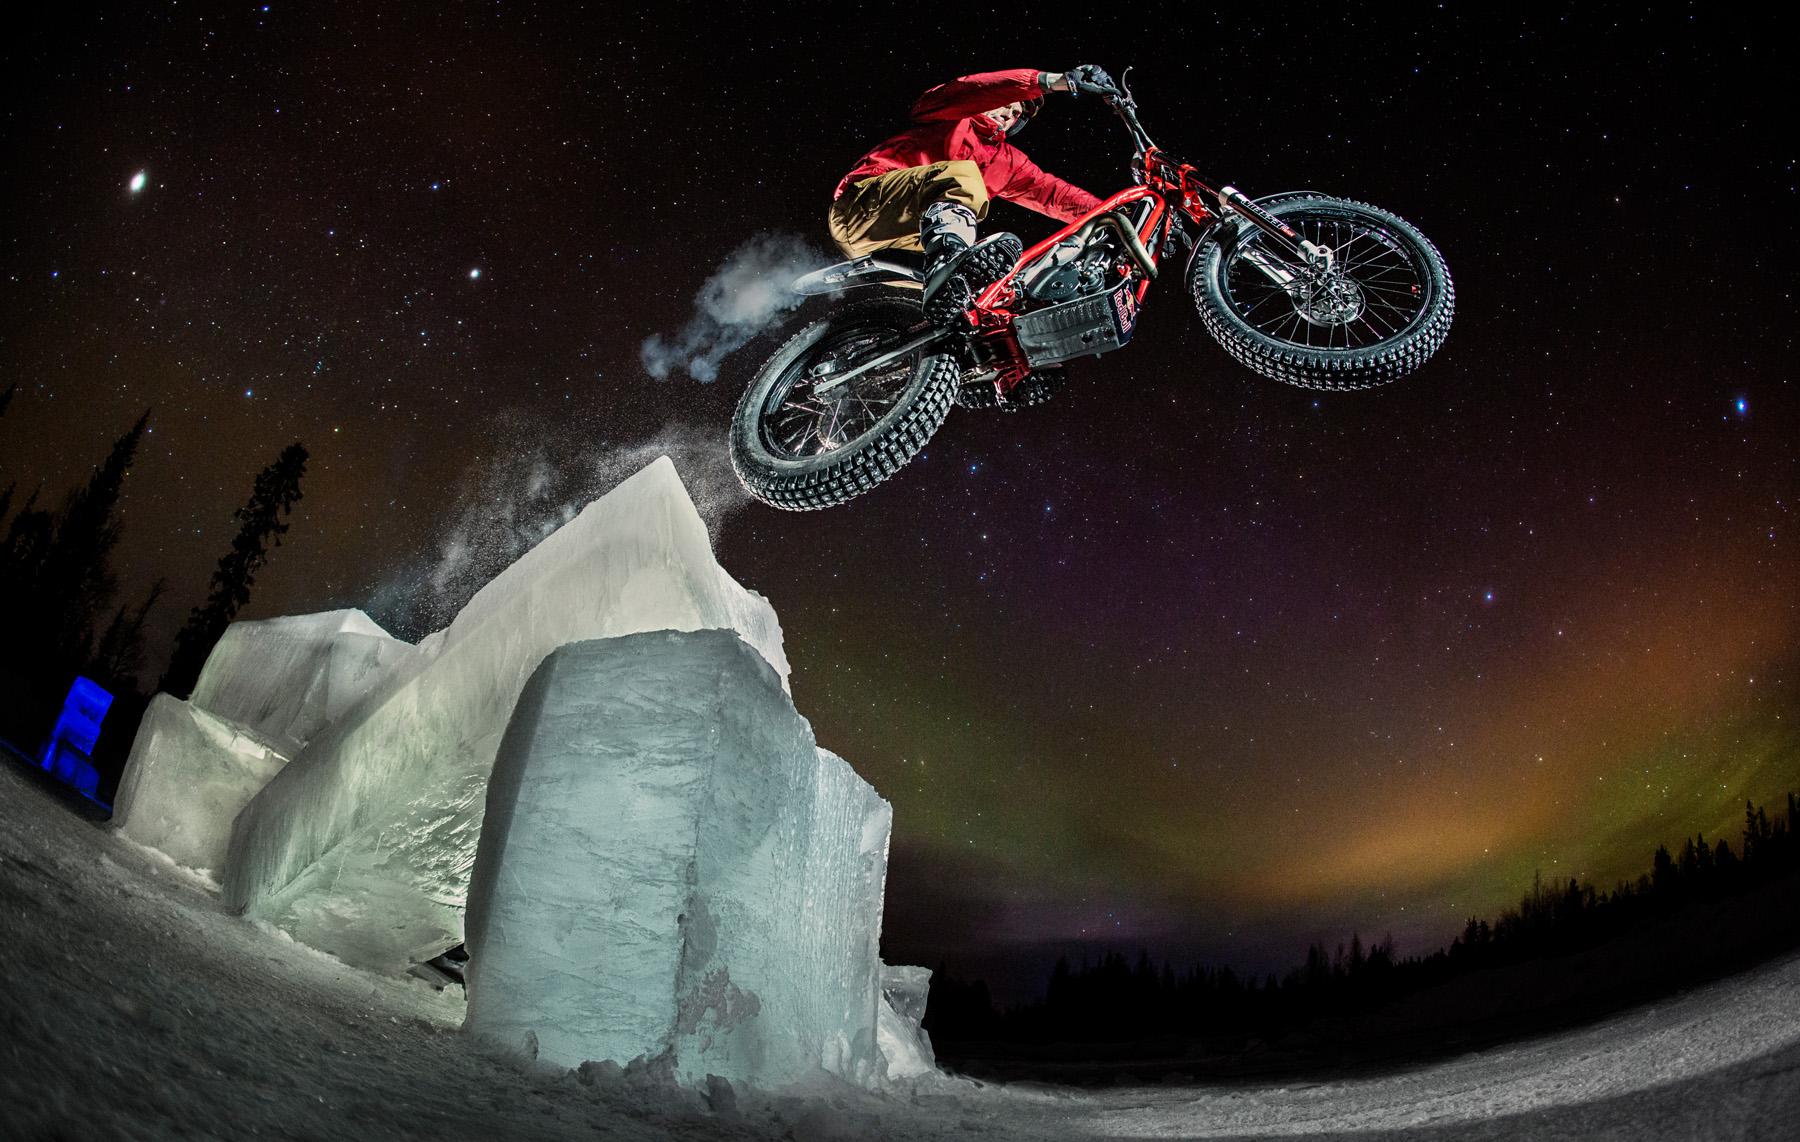 © Rutger Pauw / Red Bull Content Pool